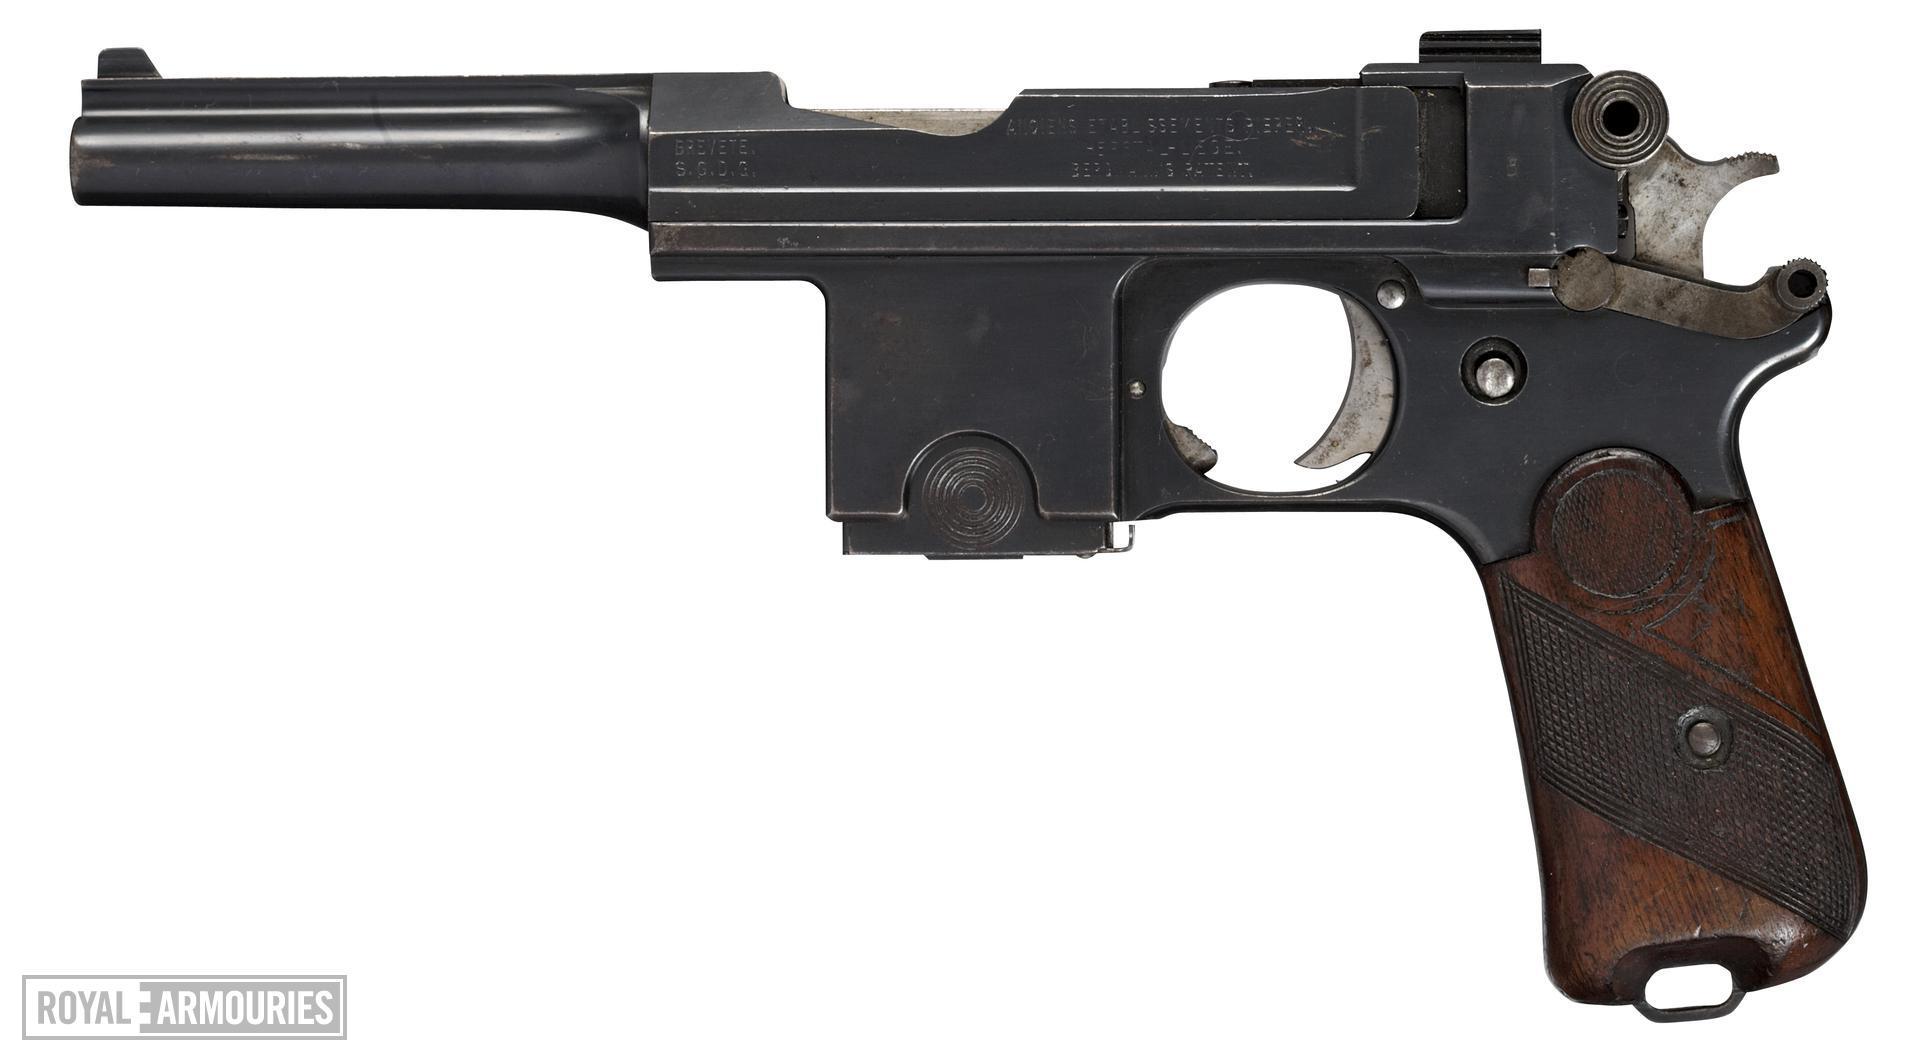 Centrefire self-loading pistol - Bergmann Bayard Model 1910 Danish military contract